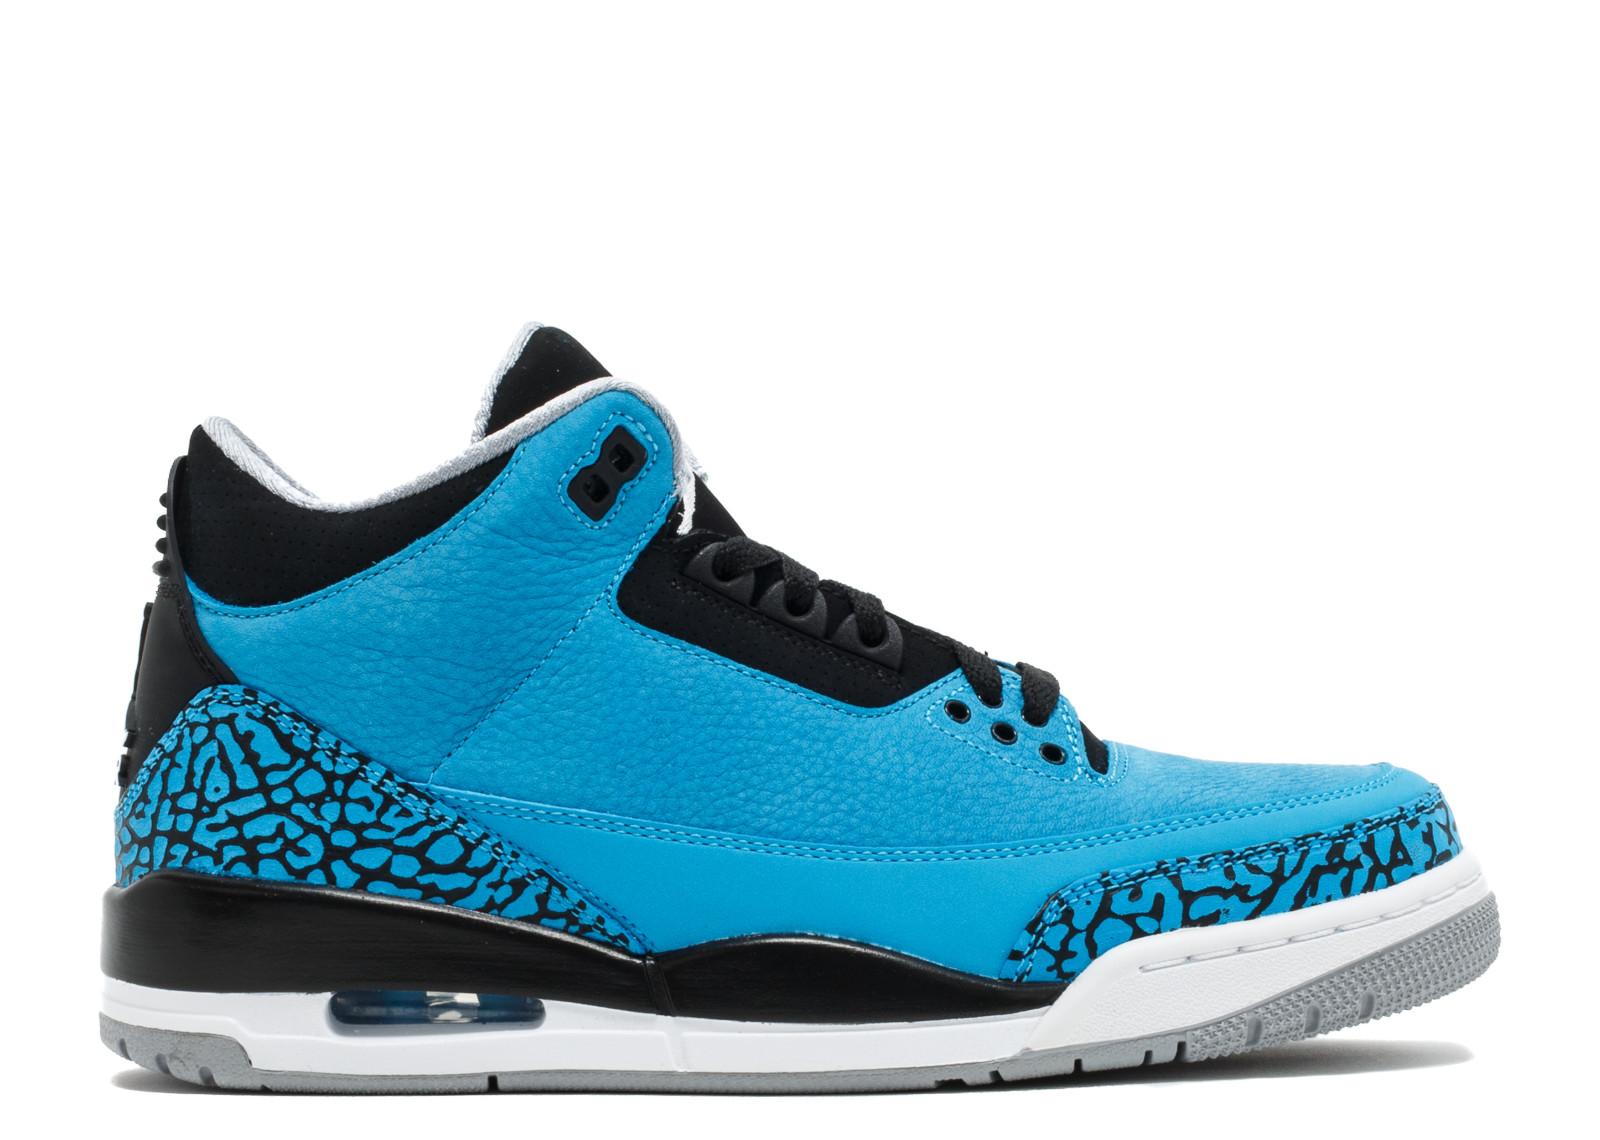 pretty nice 4d5bb 2c330 Air Jordan - Men - Air Jordan 3 Retro  Powder Blue  - 136064-406 - Size 10